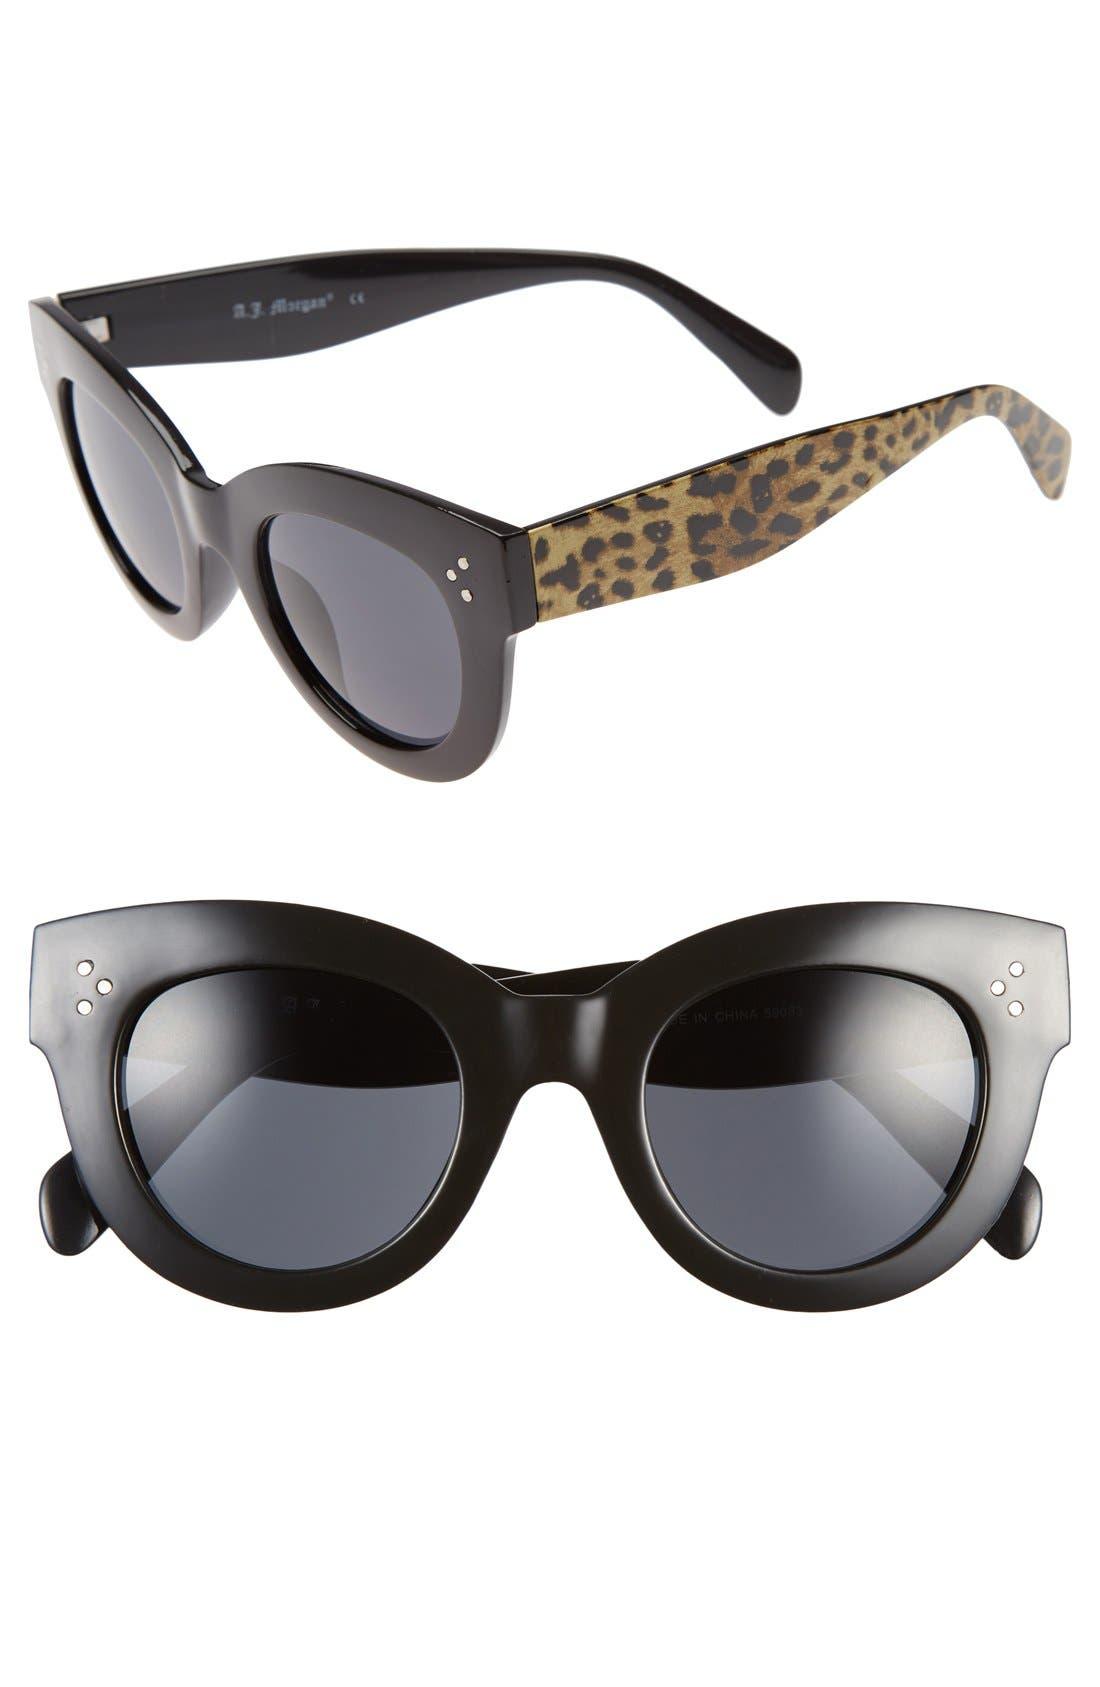 Alternate Image 1 Selected - A.J. Morgan 'Kitty' 54mm Oversized Cat Eye Sunglasses